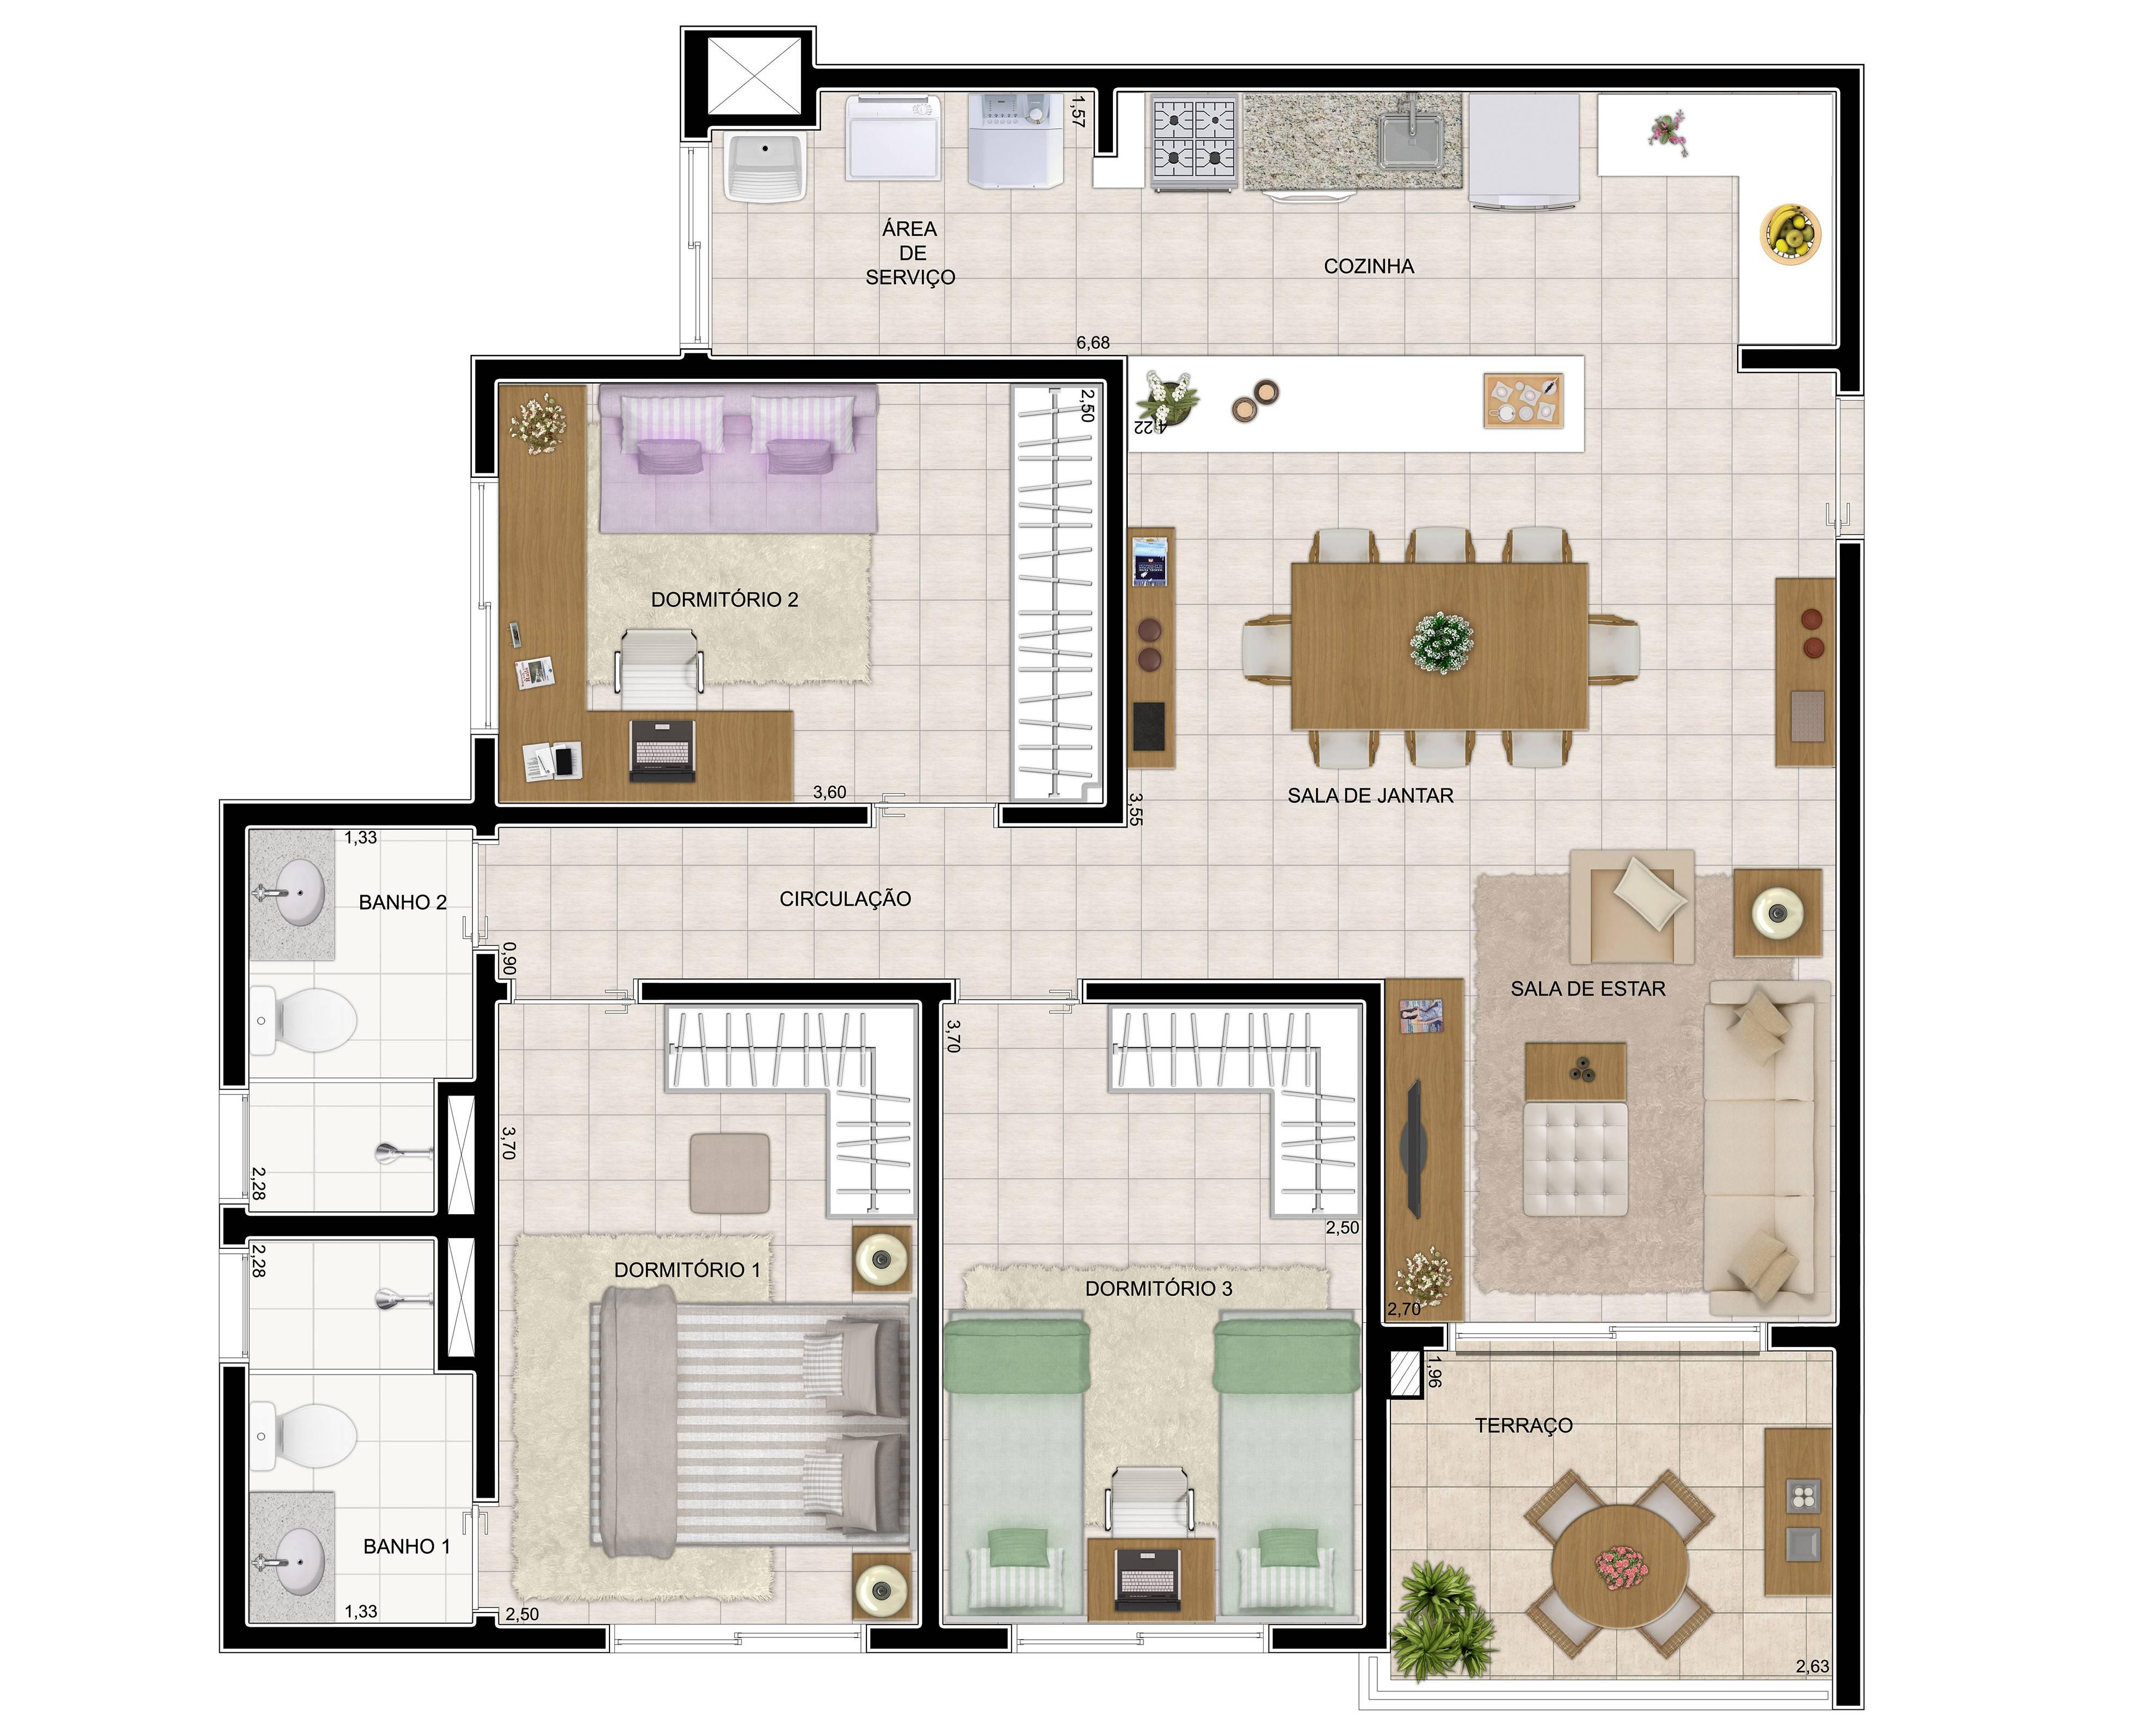 84 m² - 3 dorms